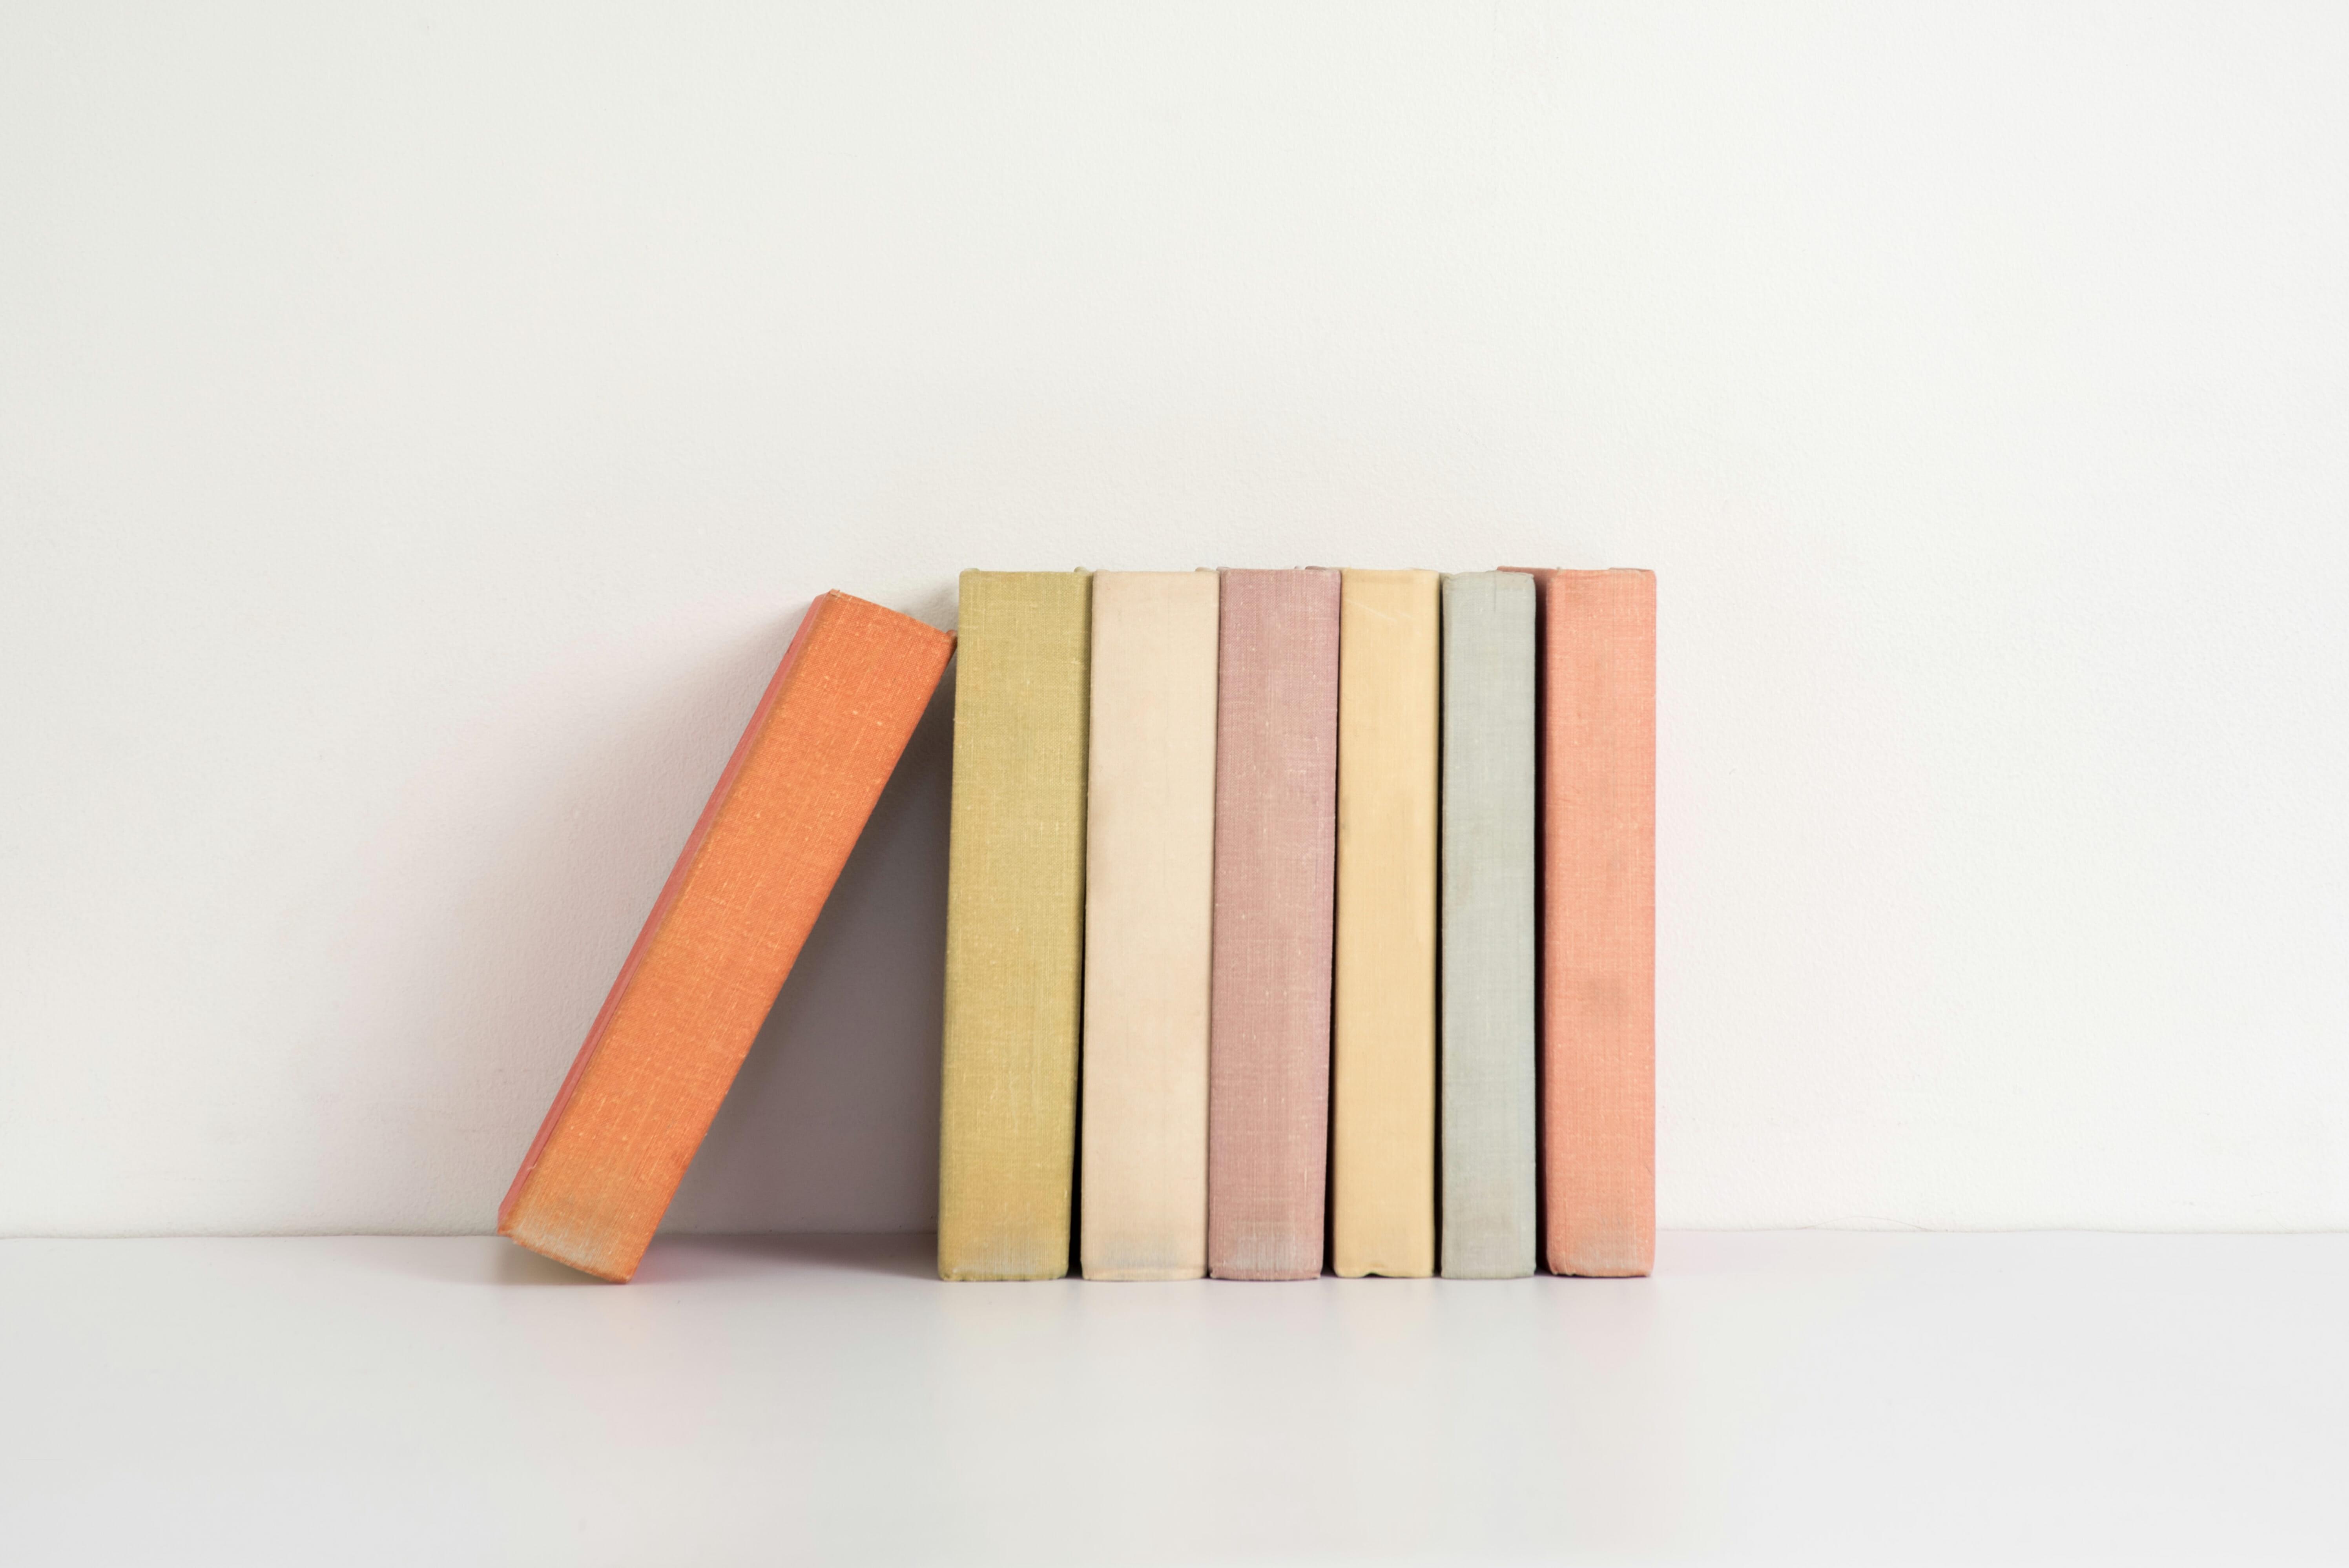 Colorful hardback books on the shelf